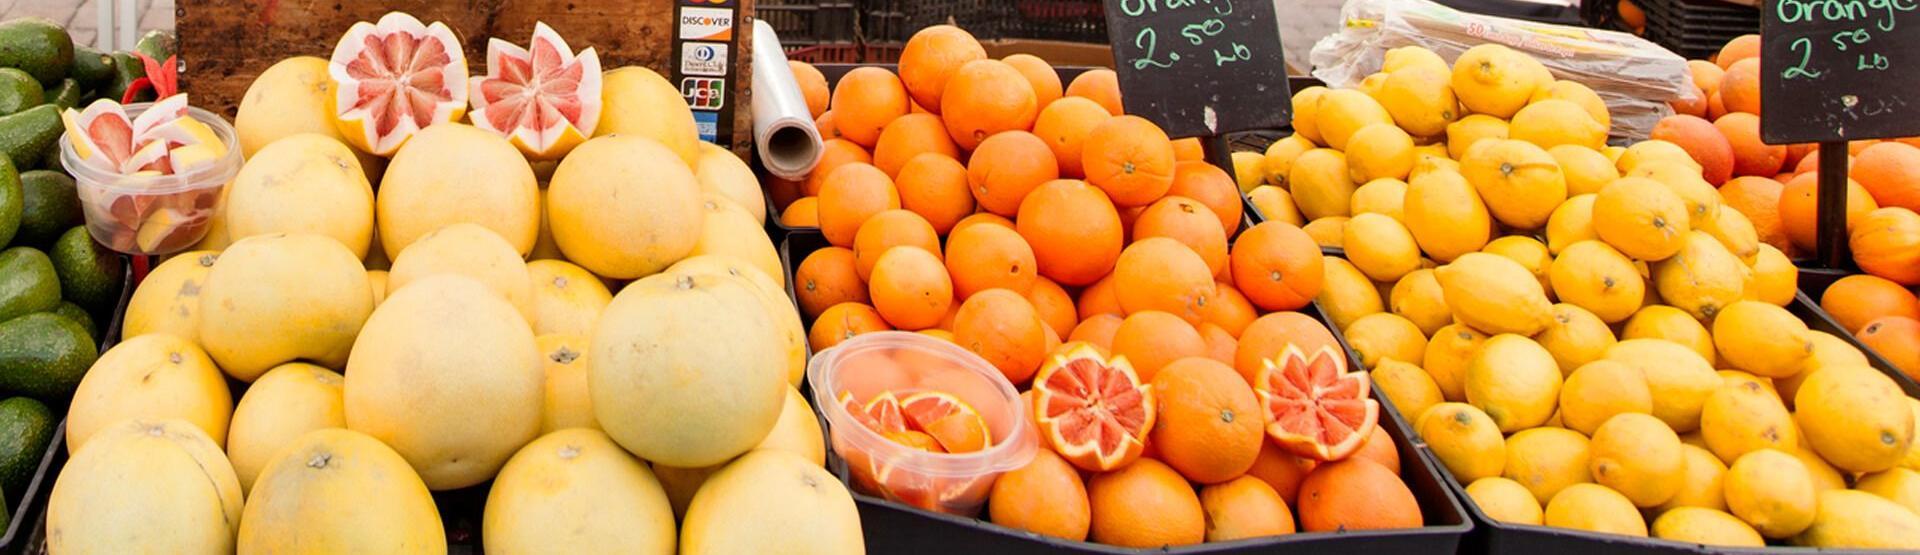 farmersmarket_produce_1920x611__hero.jpg